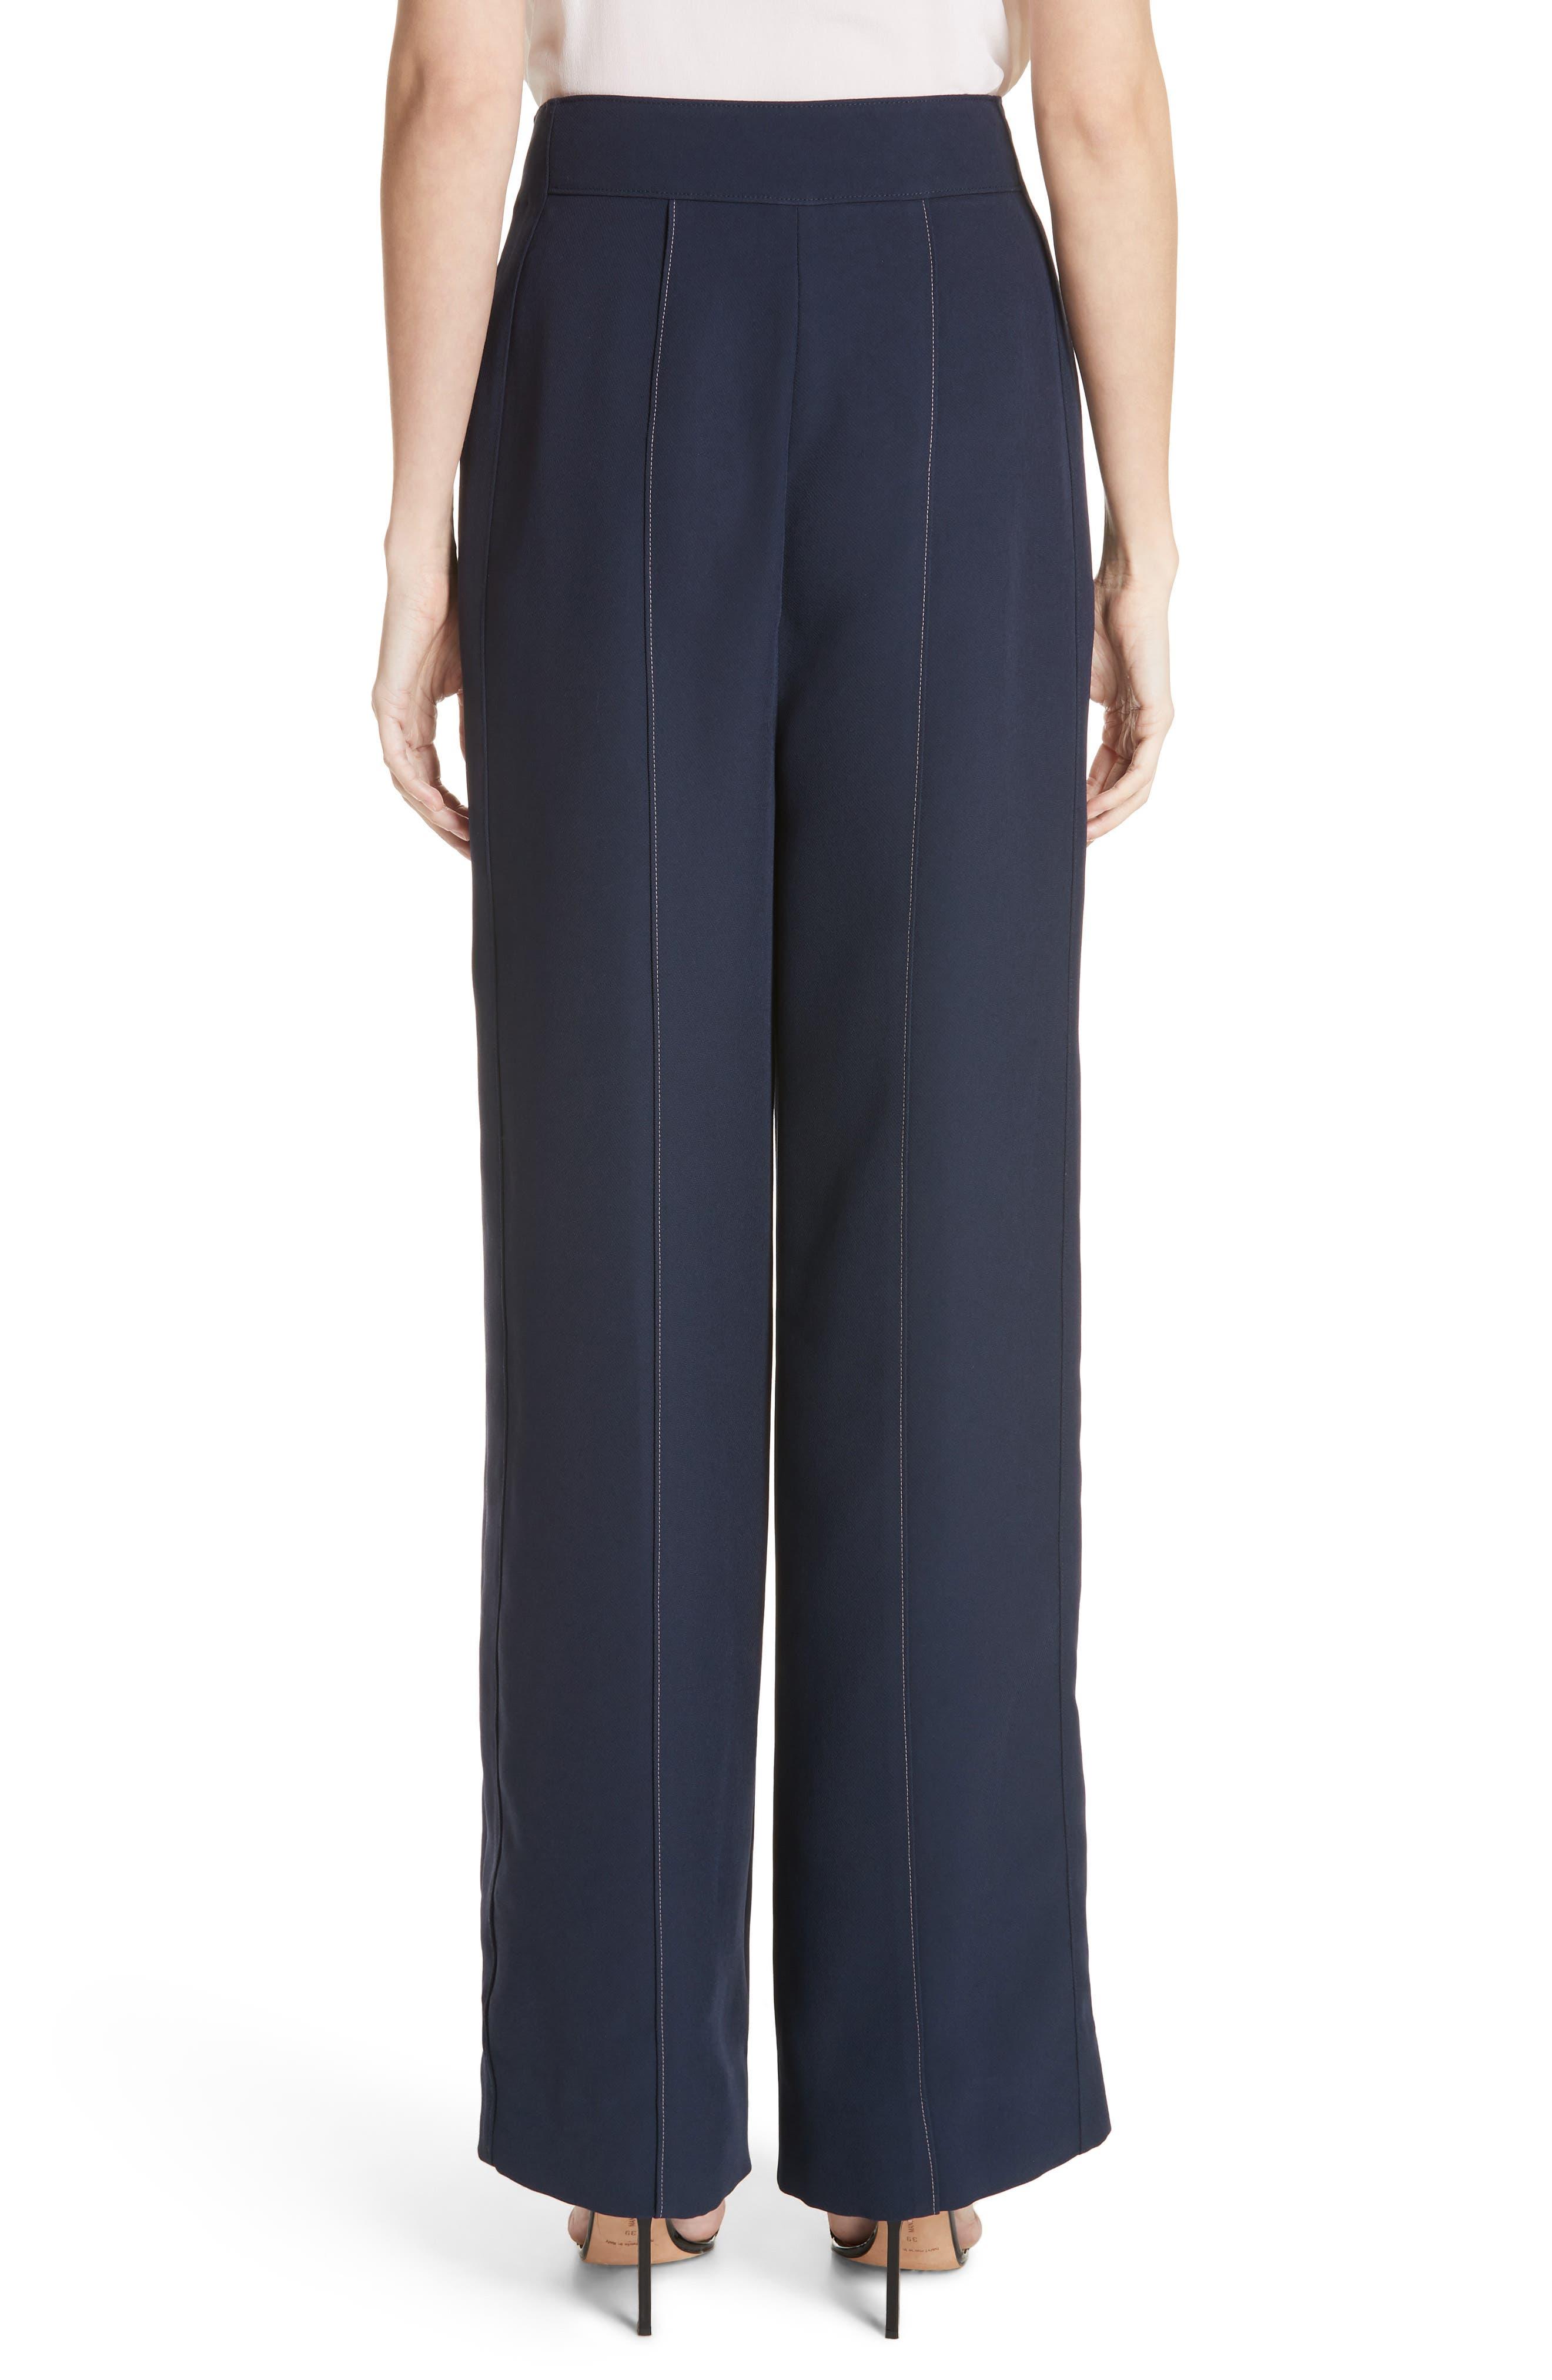 Lapari Pintuck Trousers,                             Alternate thumbnail 2, color,                             Navy